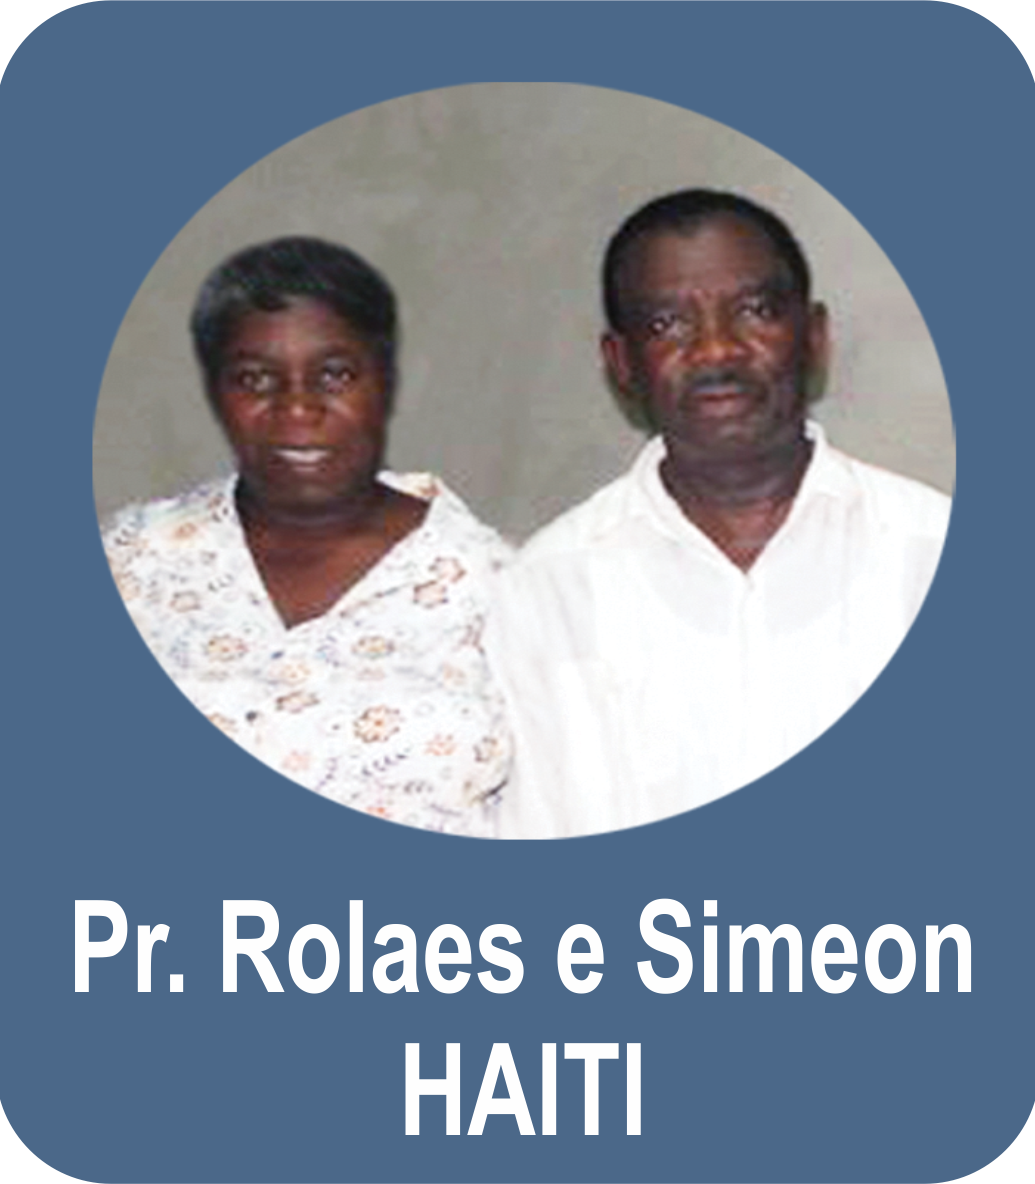 Pr. Rolaes e Miss. Simeon Etiênne - HAITI - Jean-Rabel